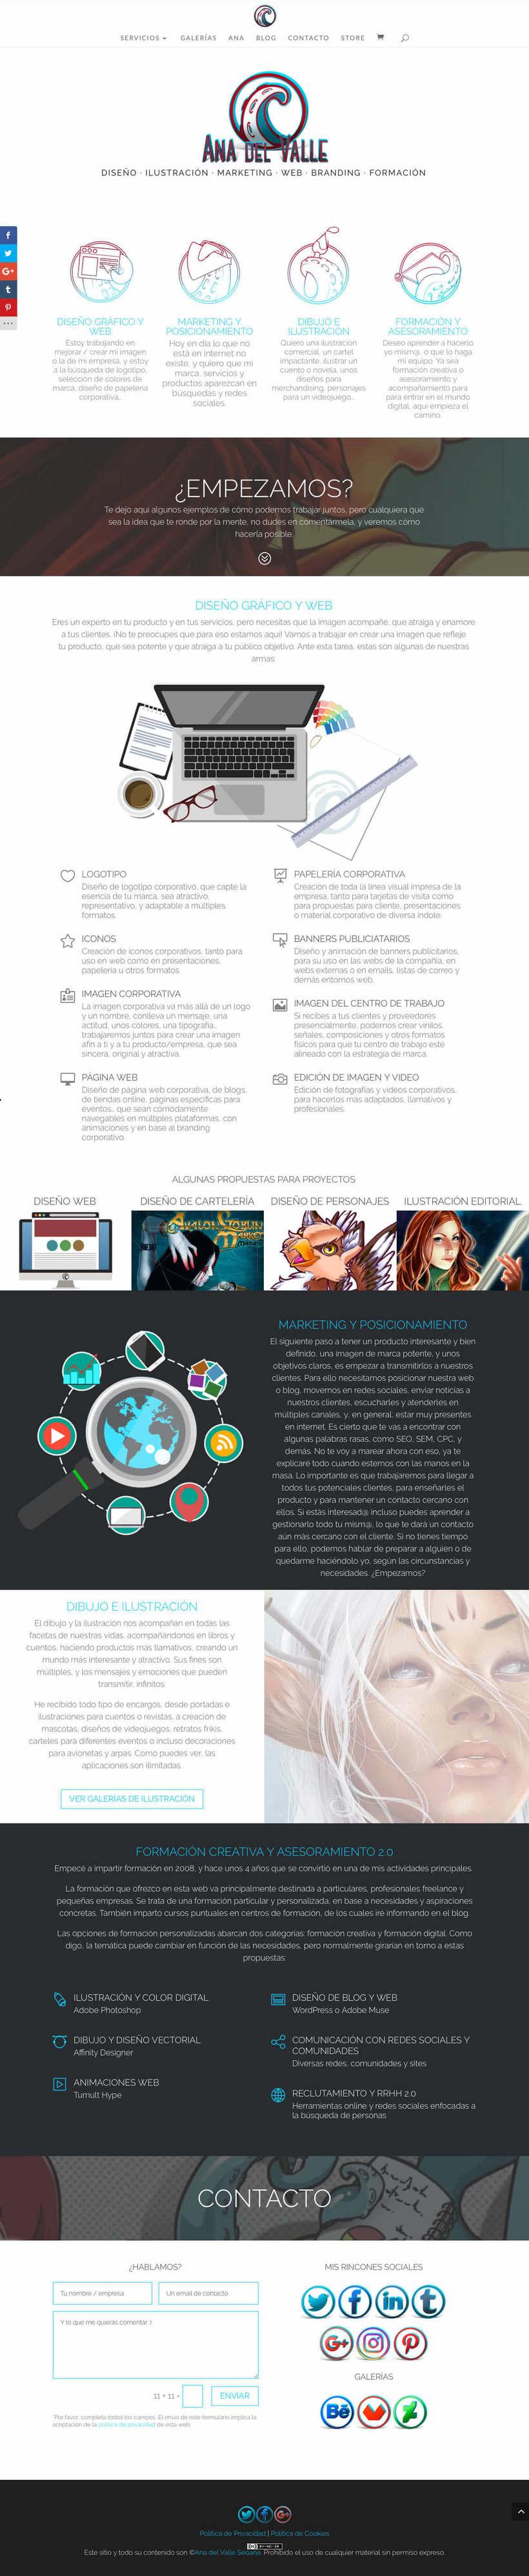 Diseño web AnadelValle.com 2